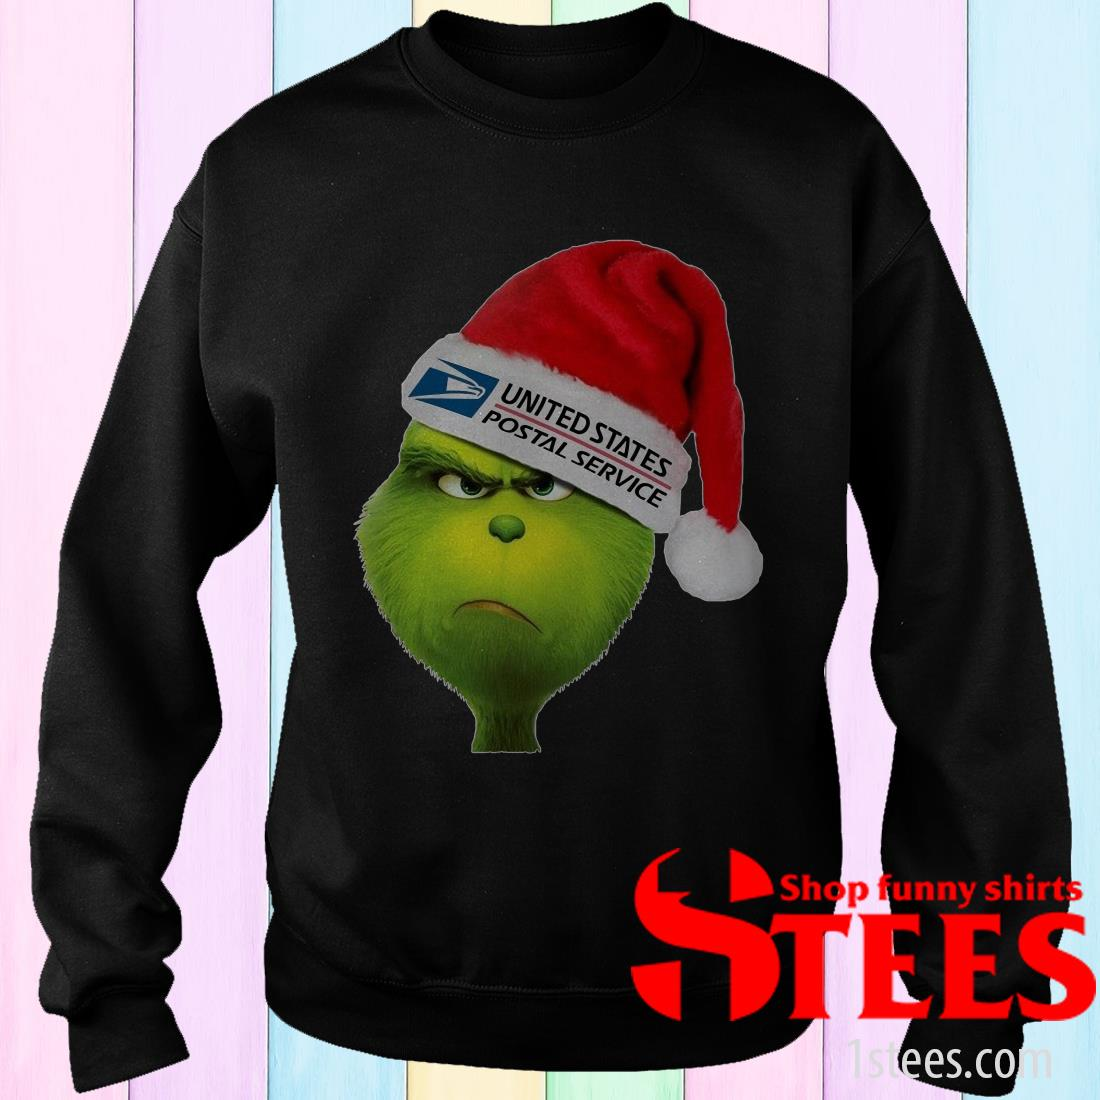 United States Postal Service Grinch Santa Hat Christmas Sweatshirt